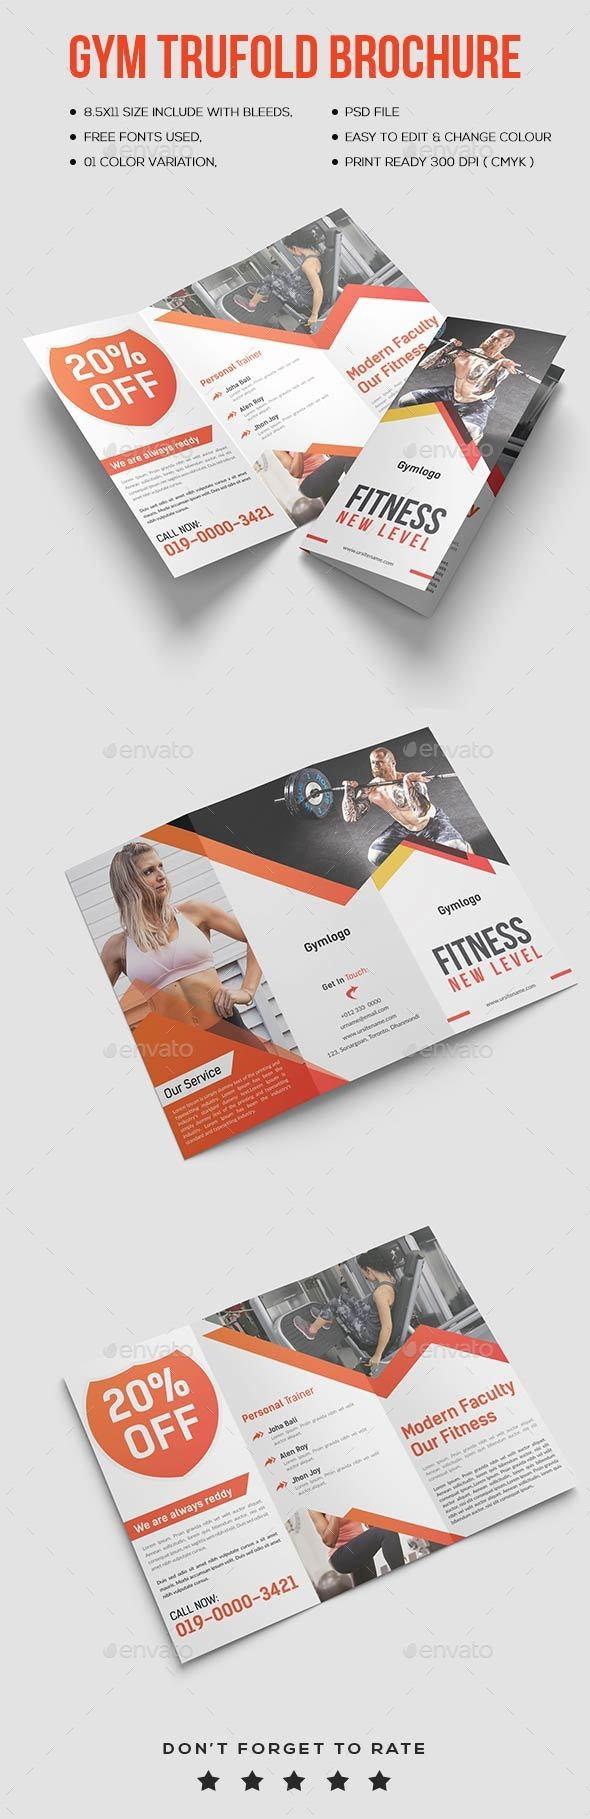 Gym TriFold Brochure - Portfolio Brochures